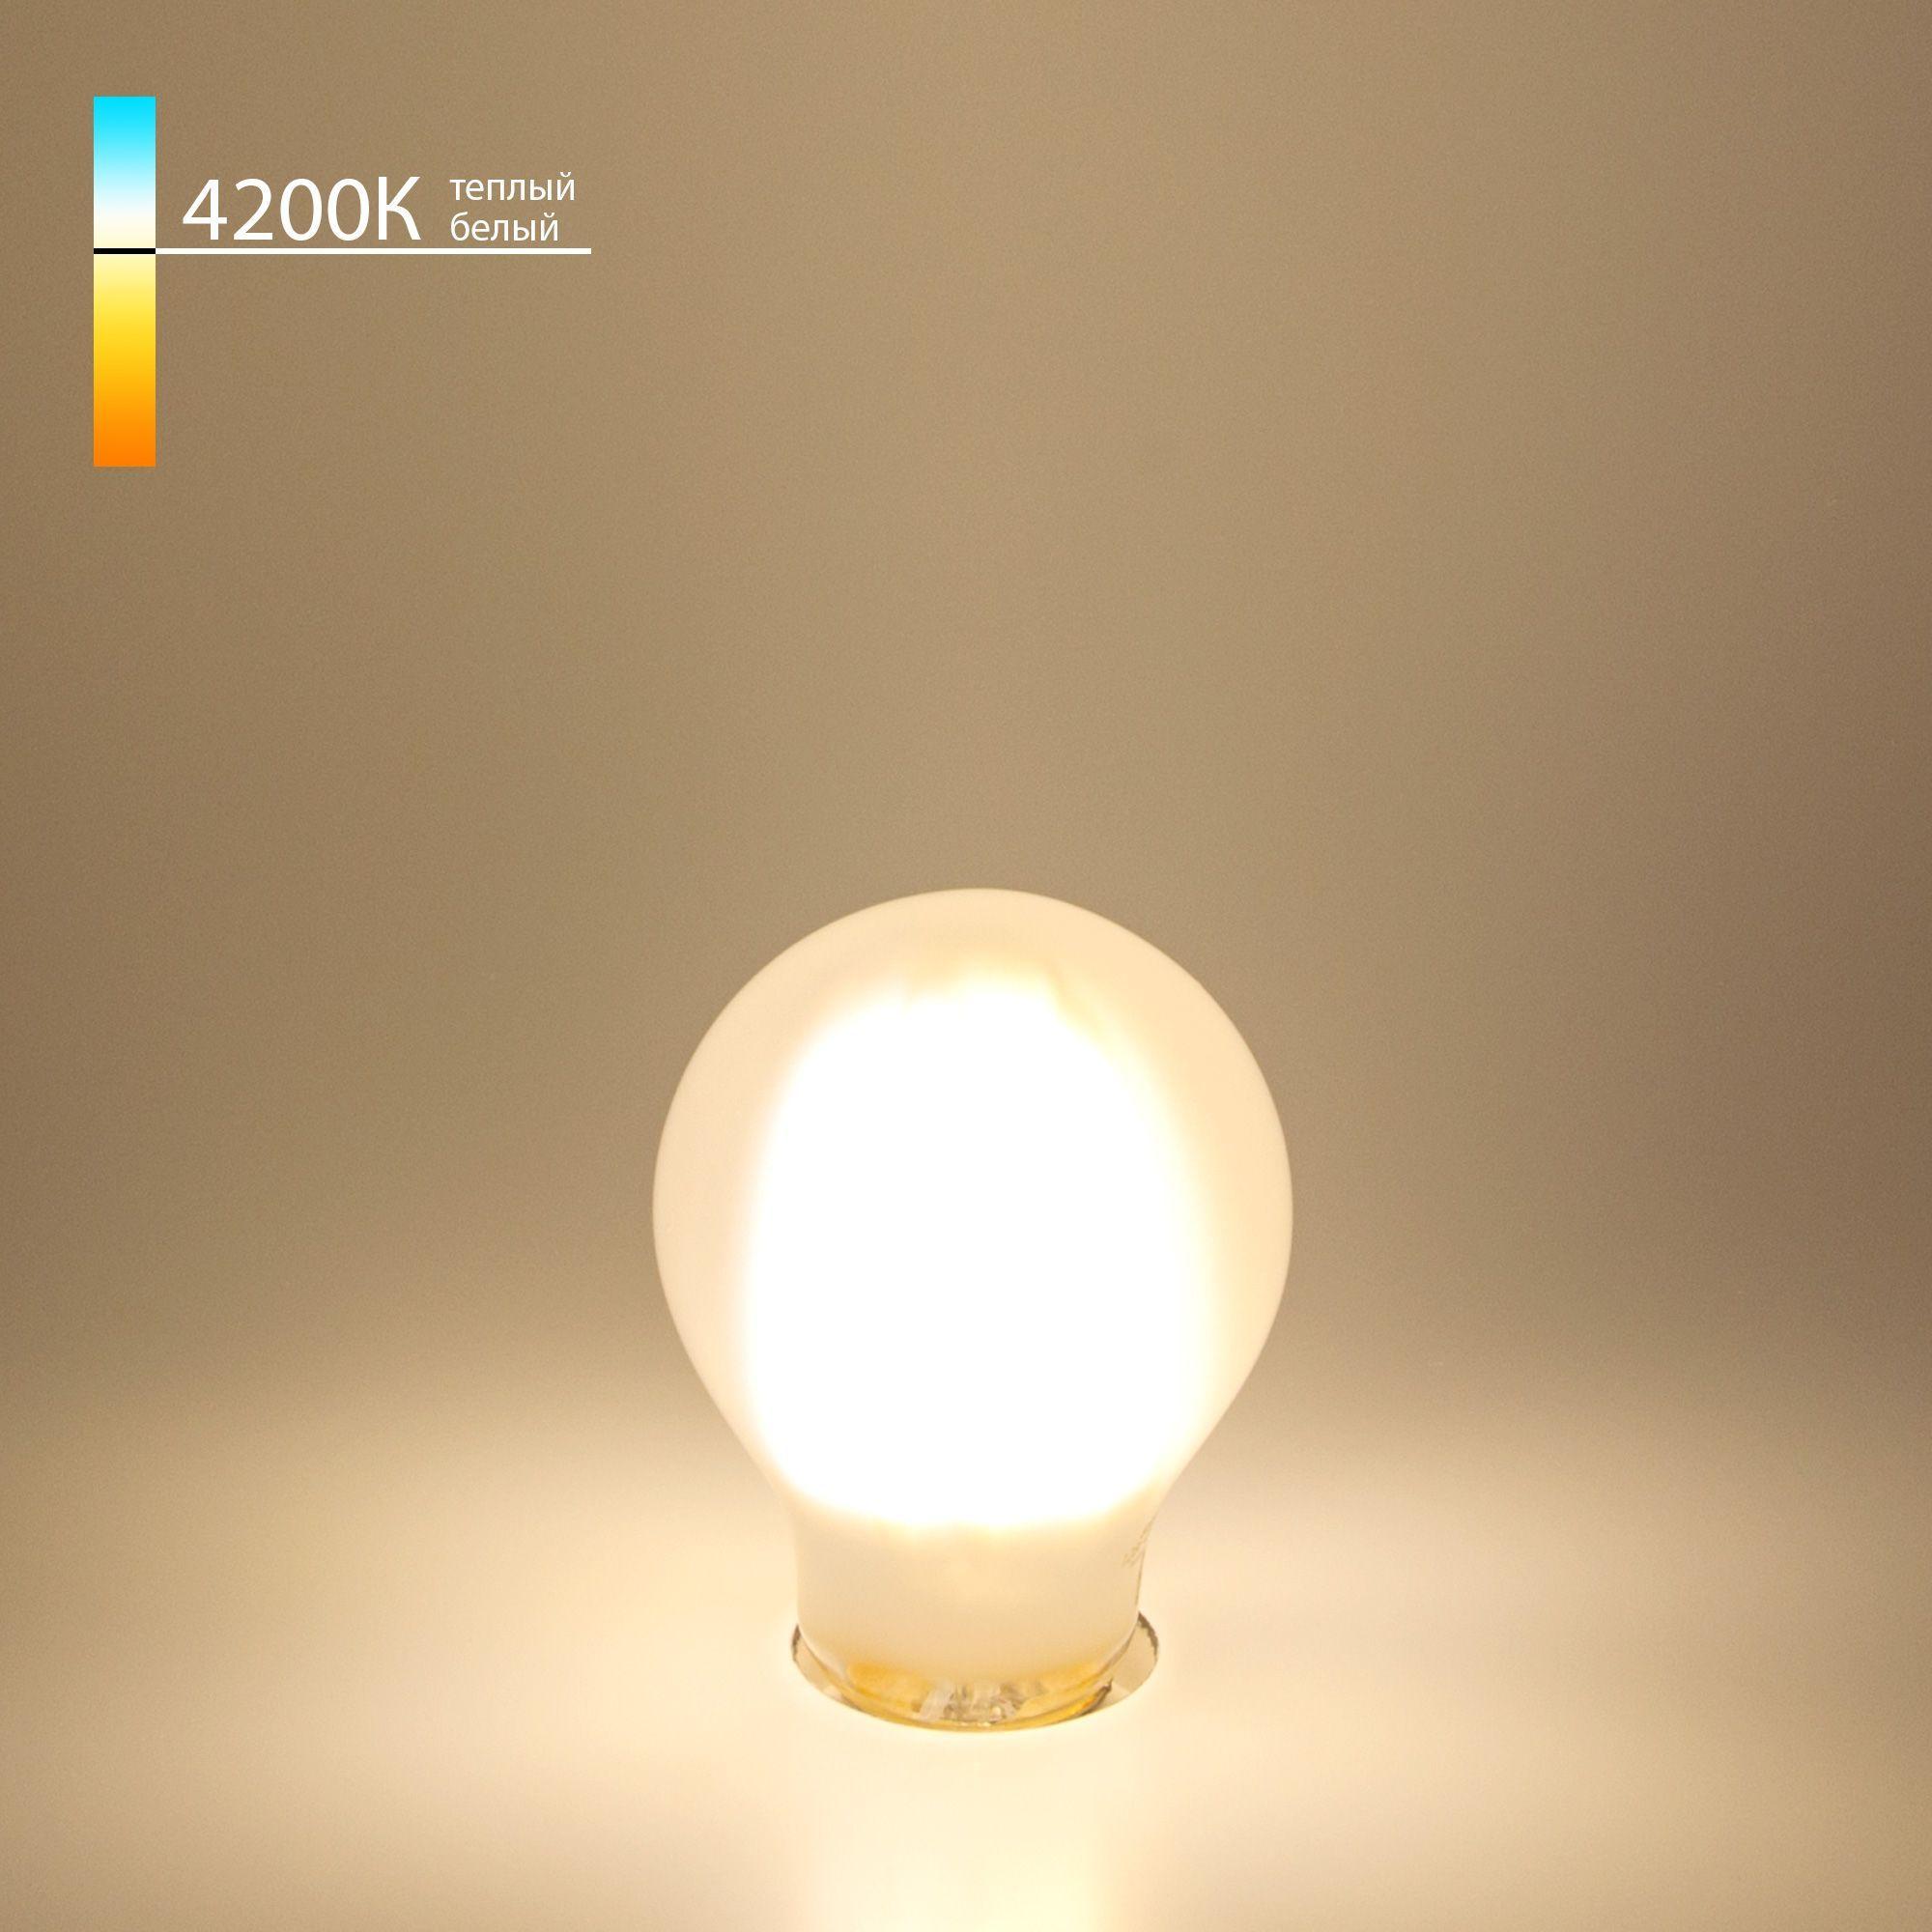 Филаментная светодиодная лампа A60 12W 4200K E27 Classic LED 12W 4200K E27 белый матовый